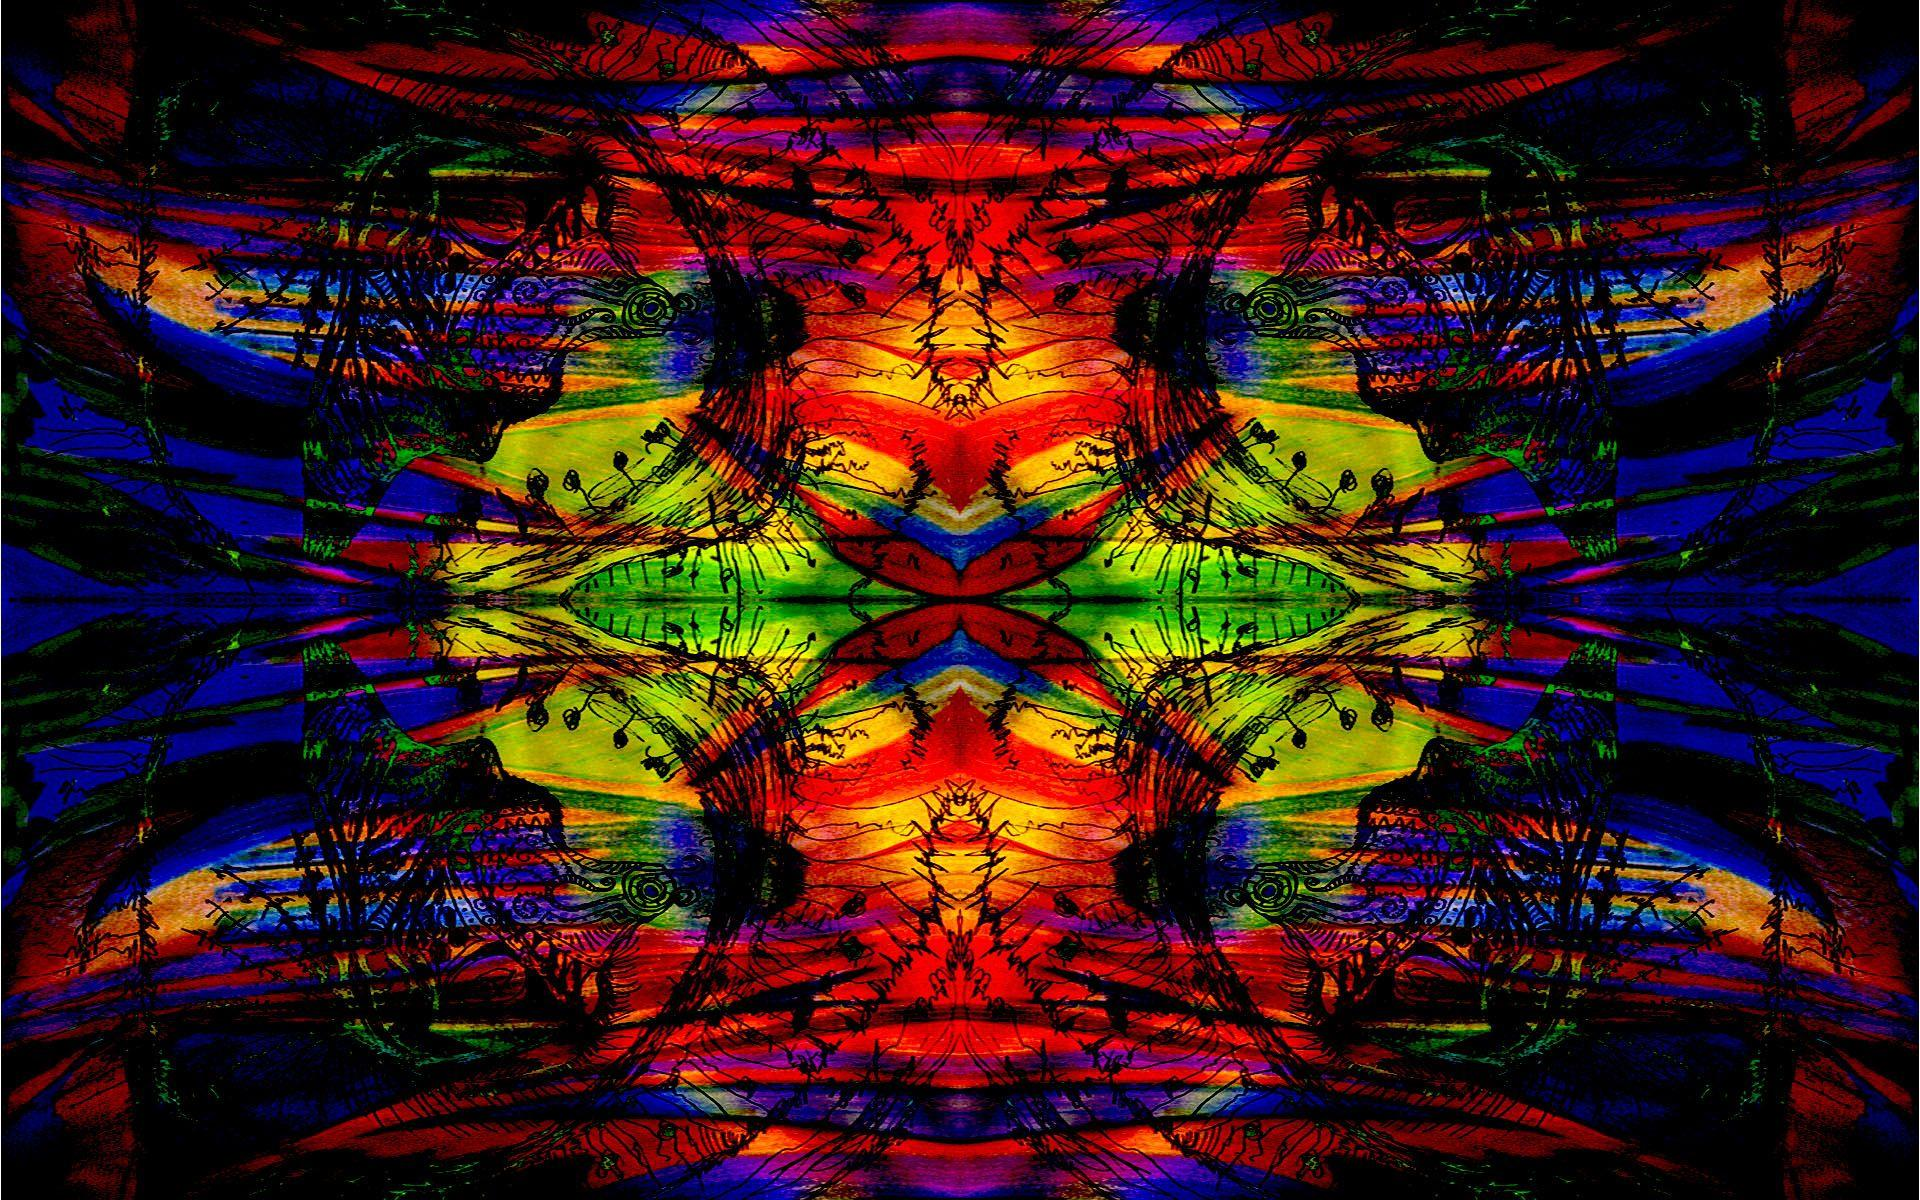 Sugar Skull Iphone Wallpaper Trippy Acid Wallpapers Wallpaper Cave